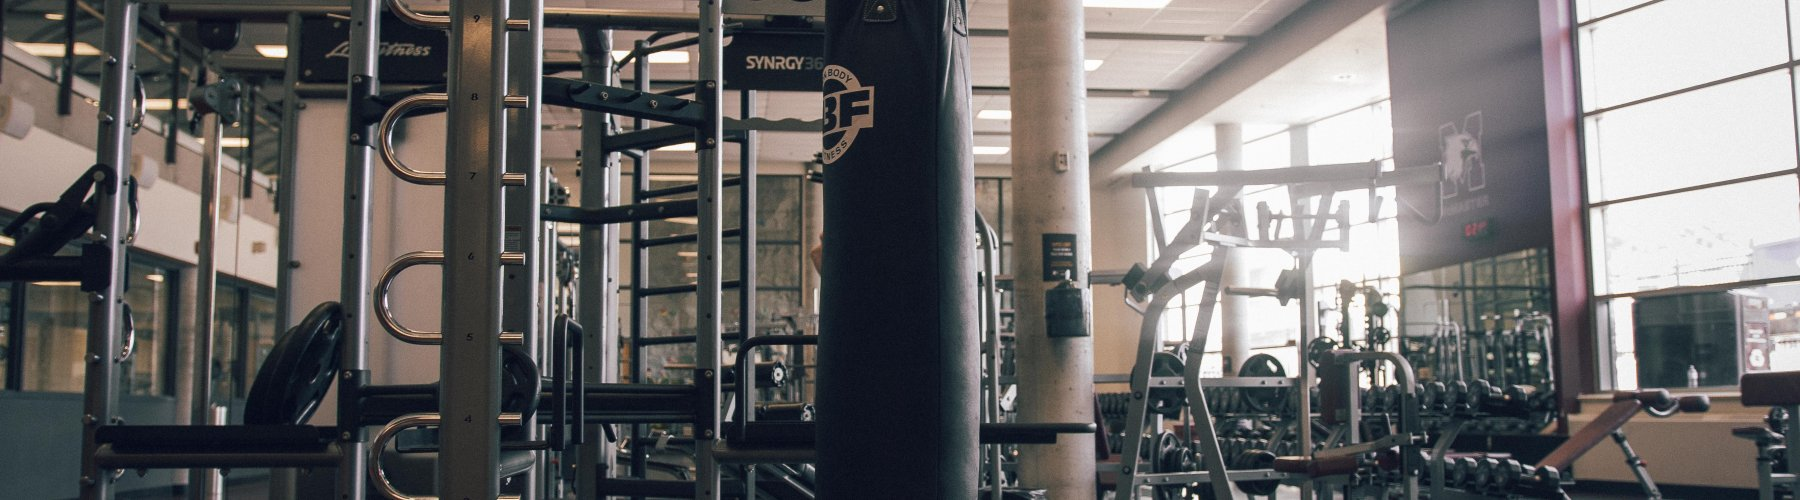 Facility & Equipment